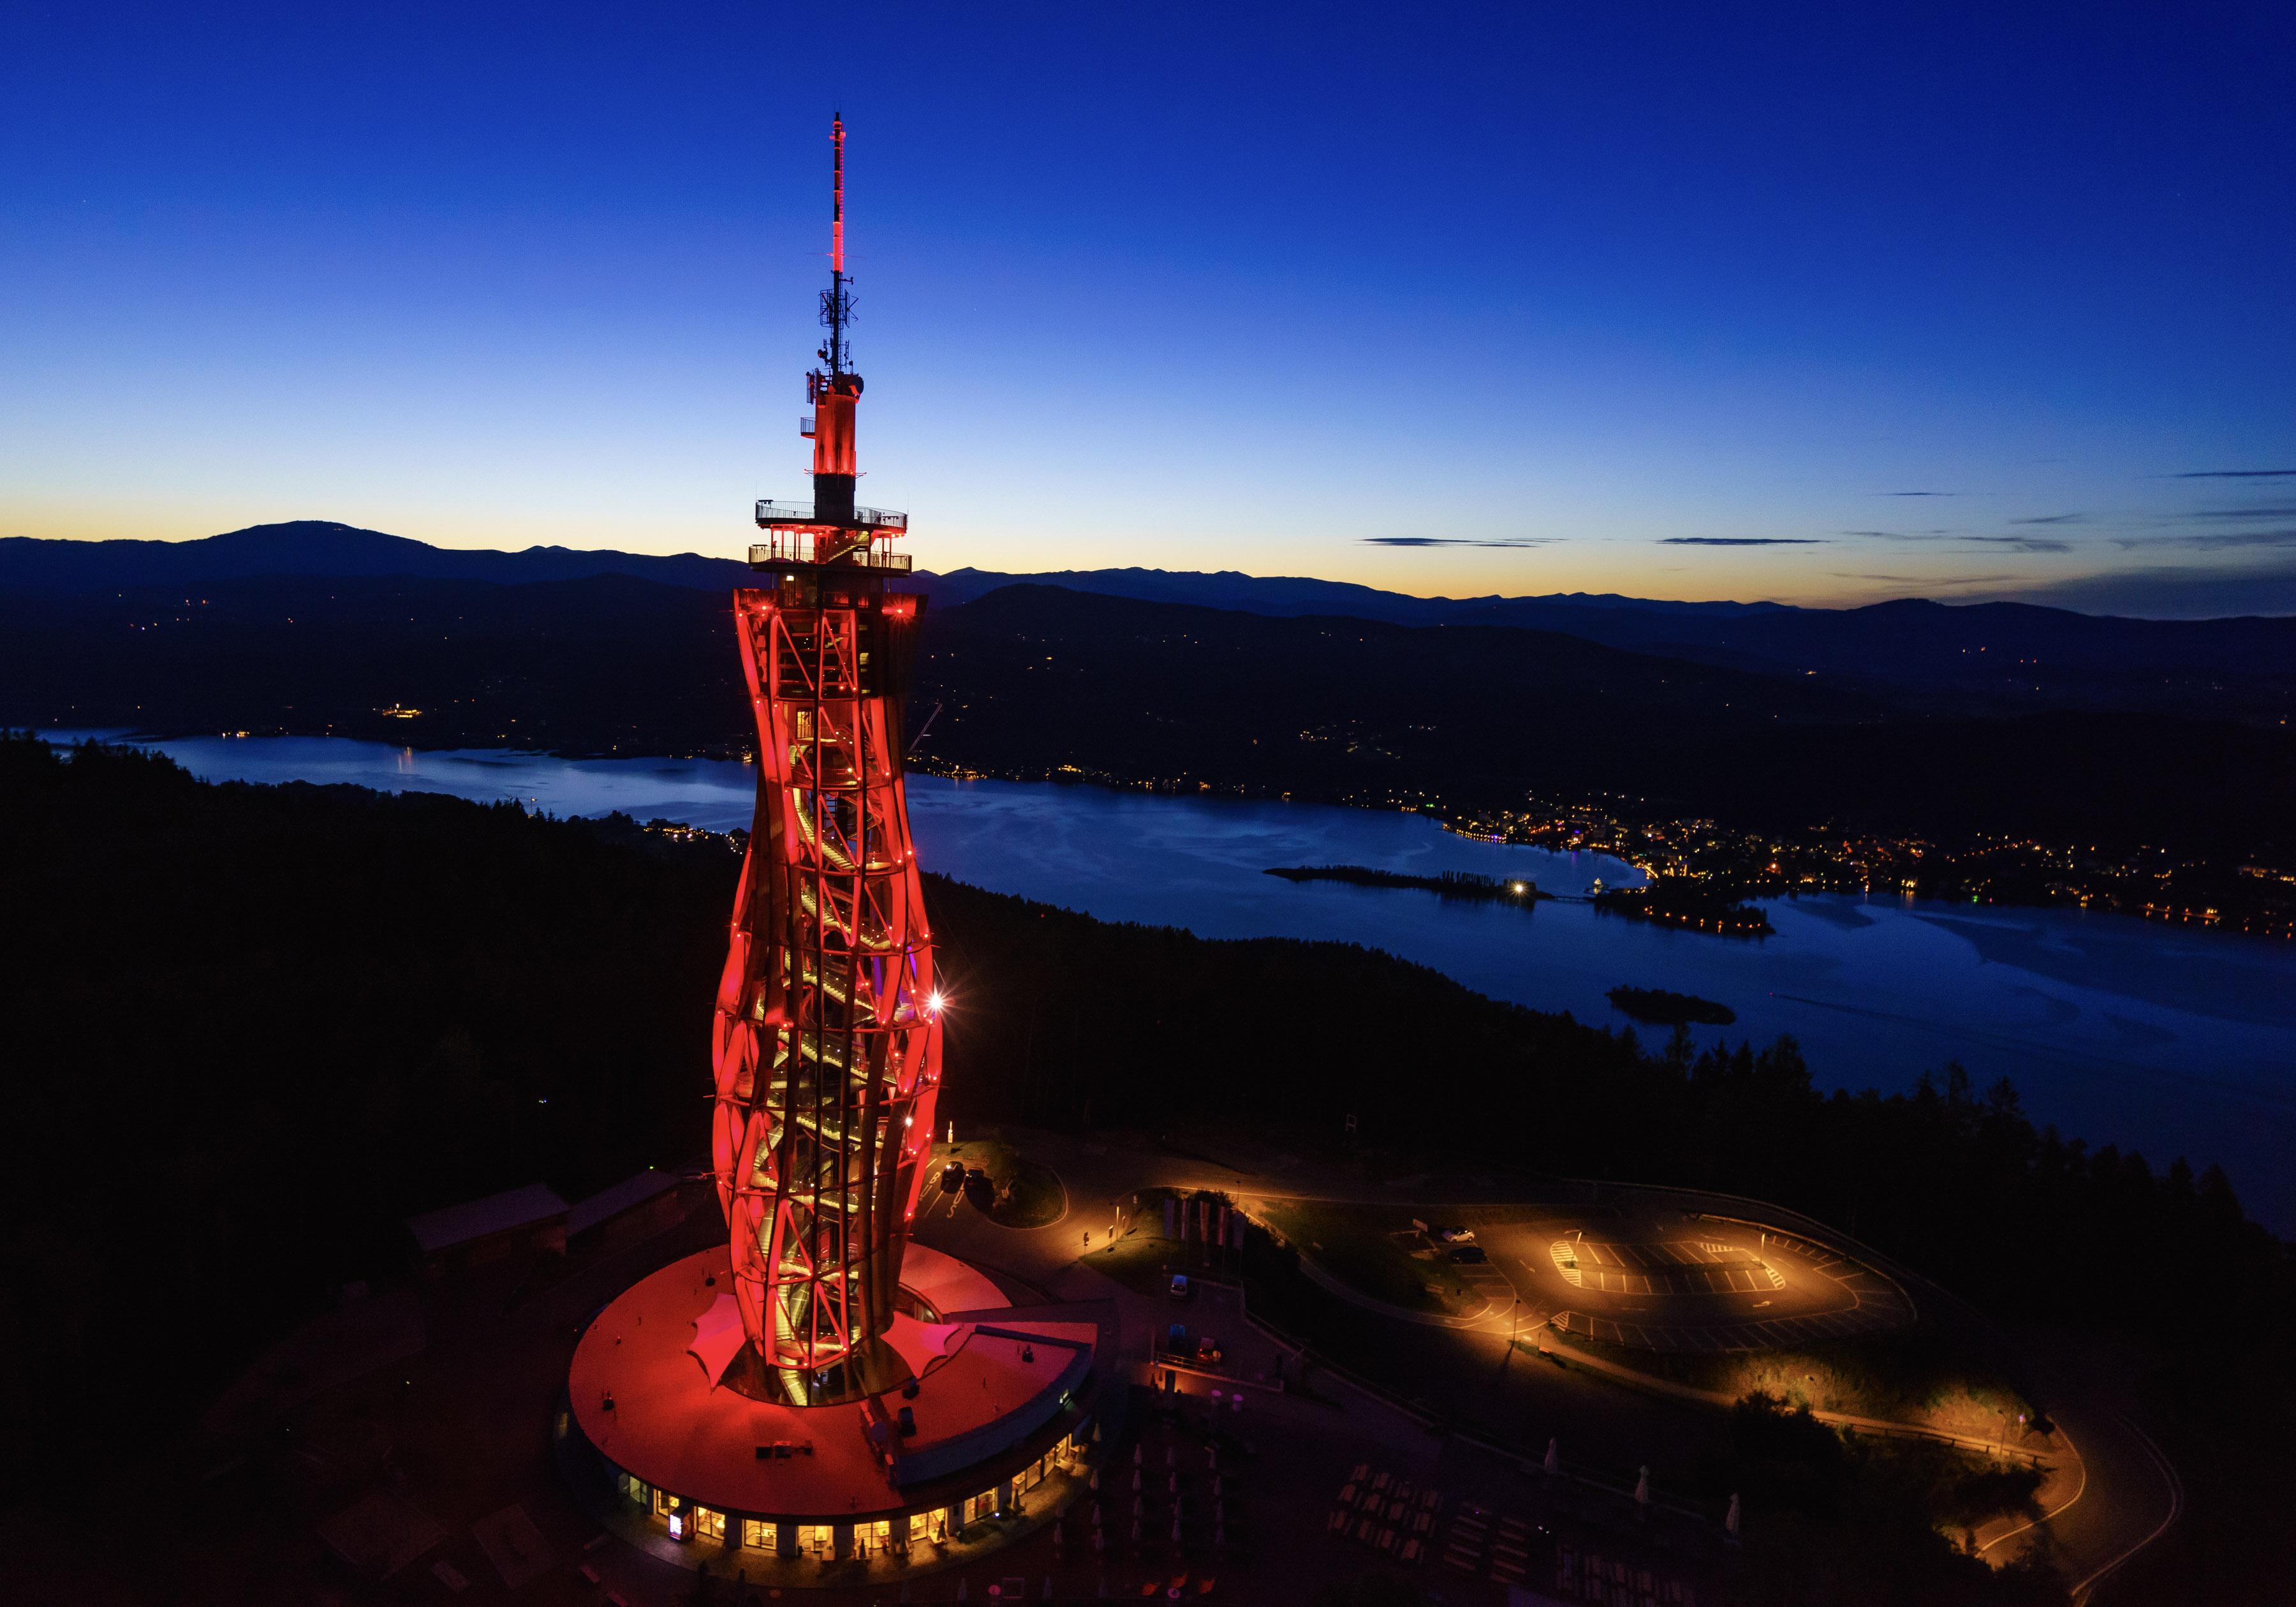 Pyramidenkogel Rot - Pyramidenkogel-Turm wird Eishockey-Botschafter